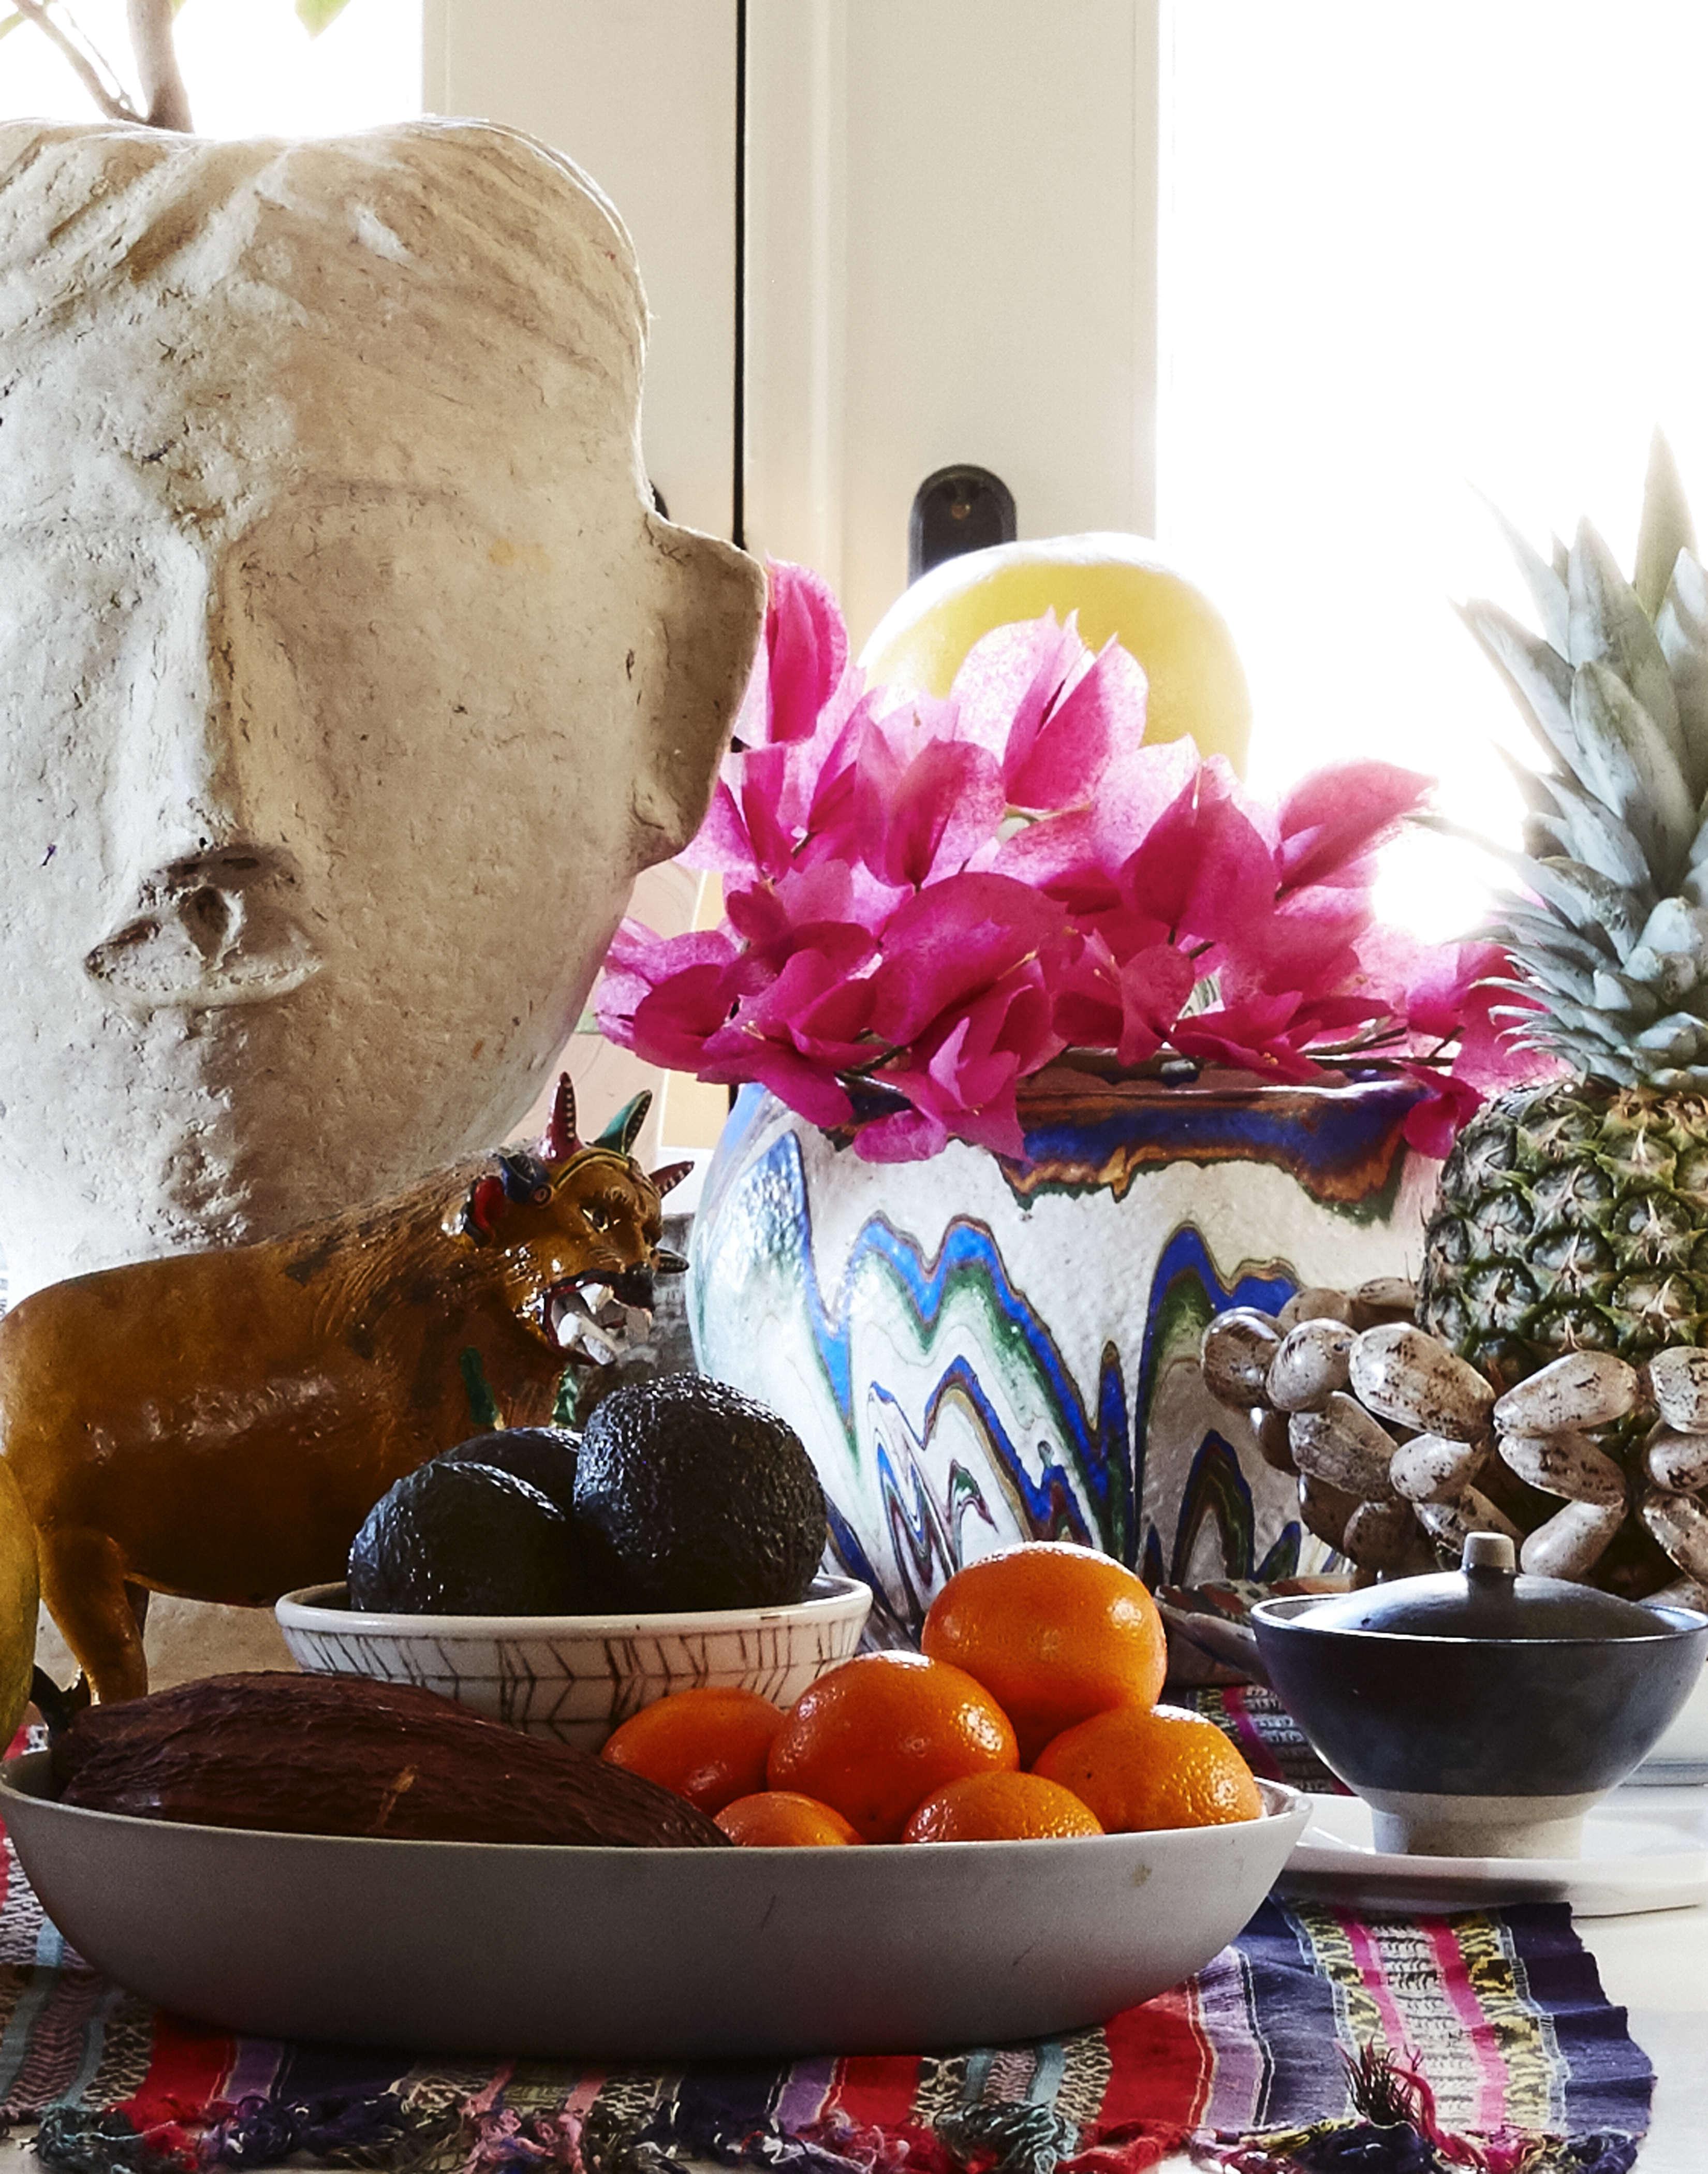 The table displays Livia&#8